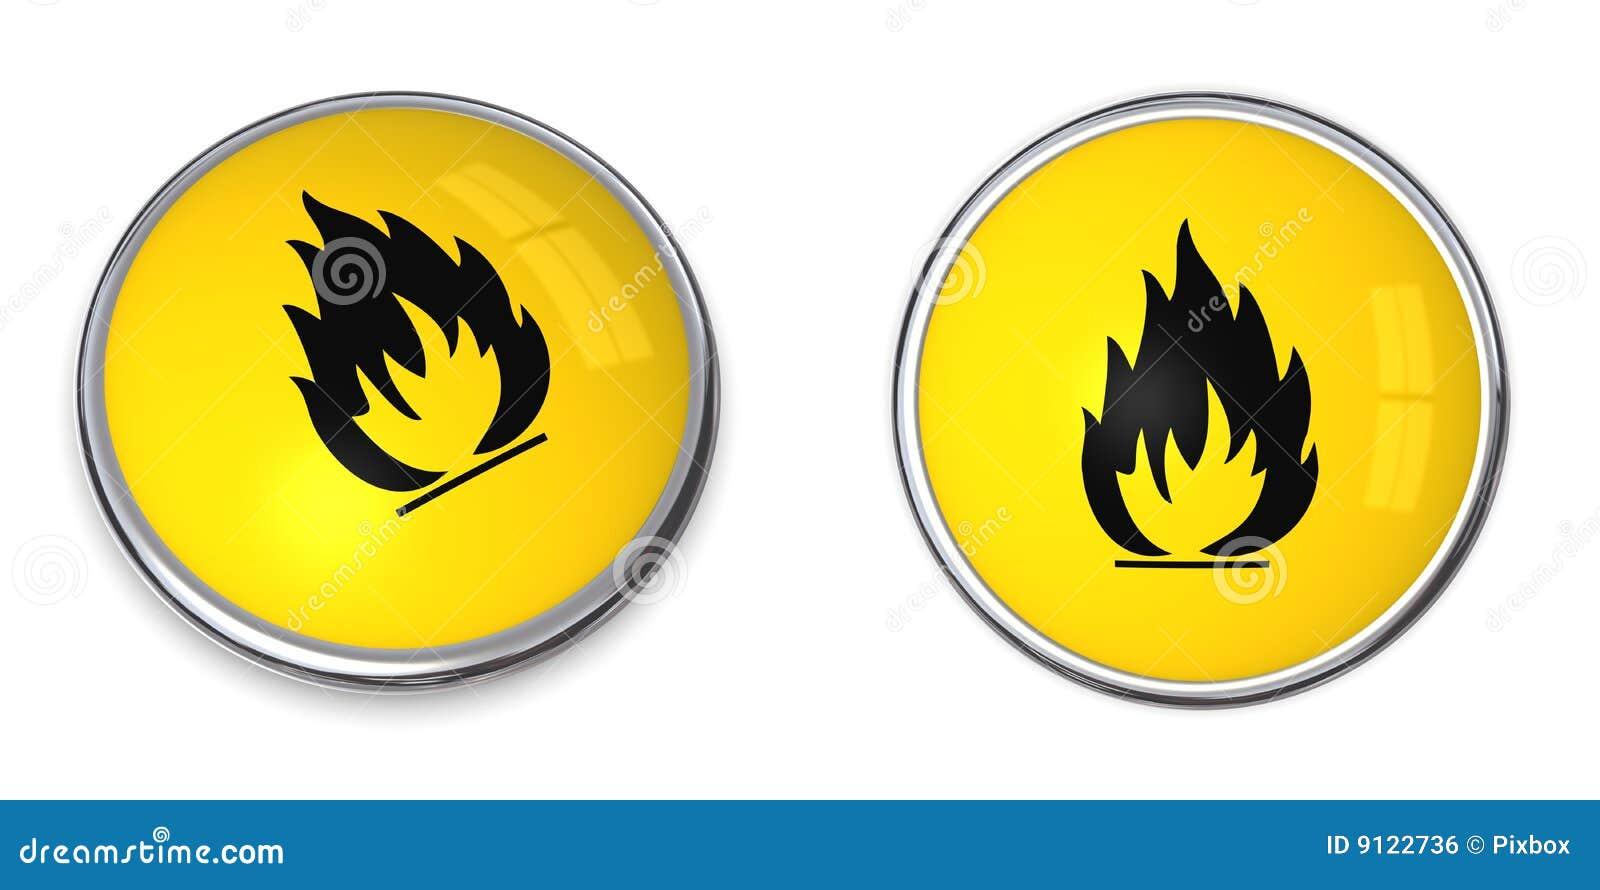 Button flammable symbol stock illustration illustration of button flammable symbol buycottarizona